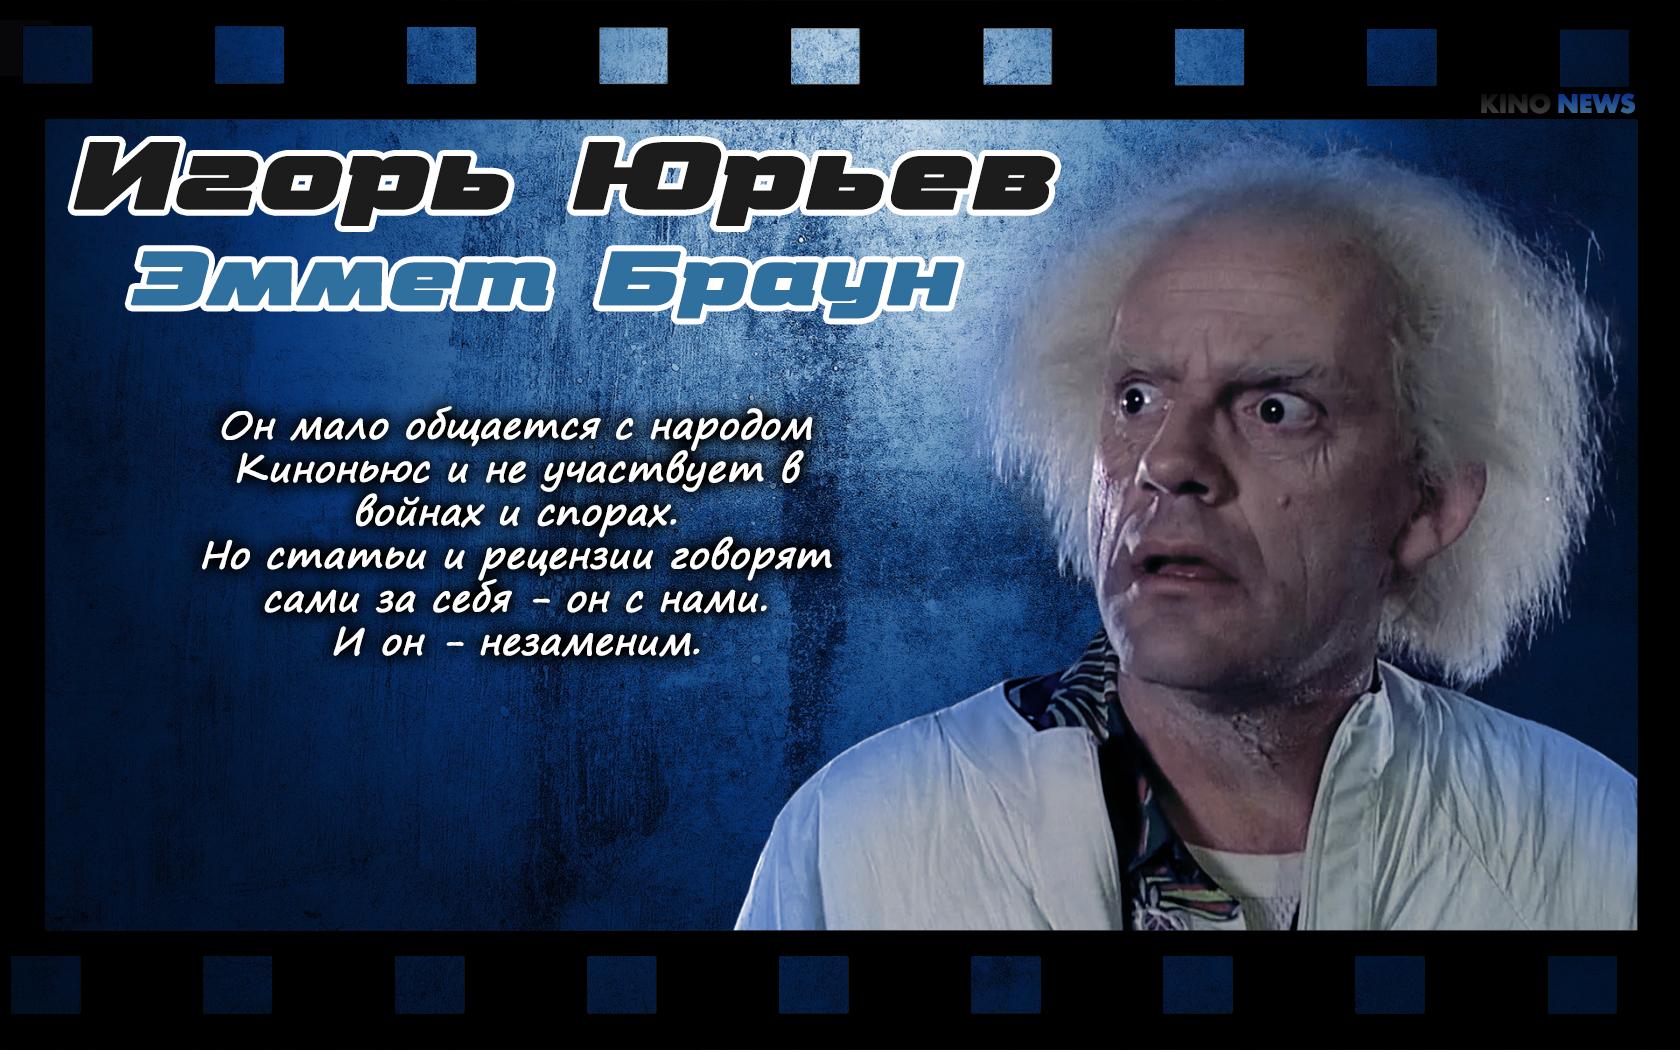 https://www.kinonews.ru/insimgs/2017/persimg/persimg77944_62.jpg